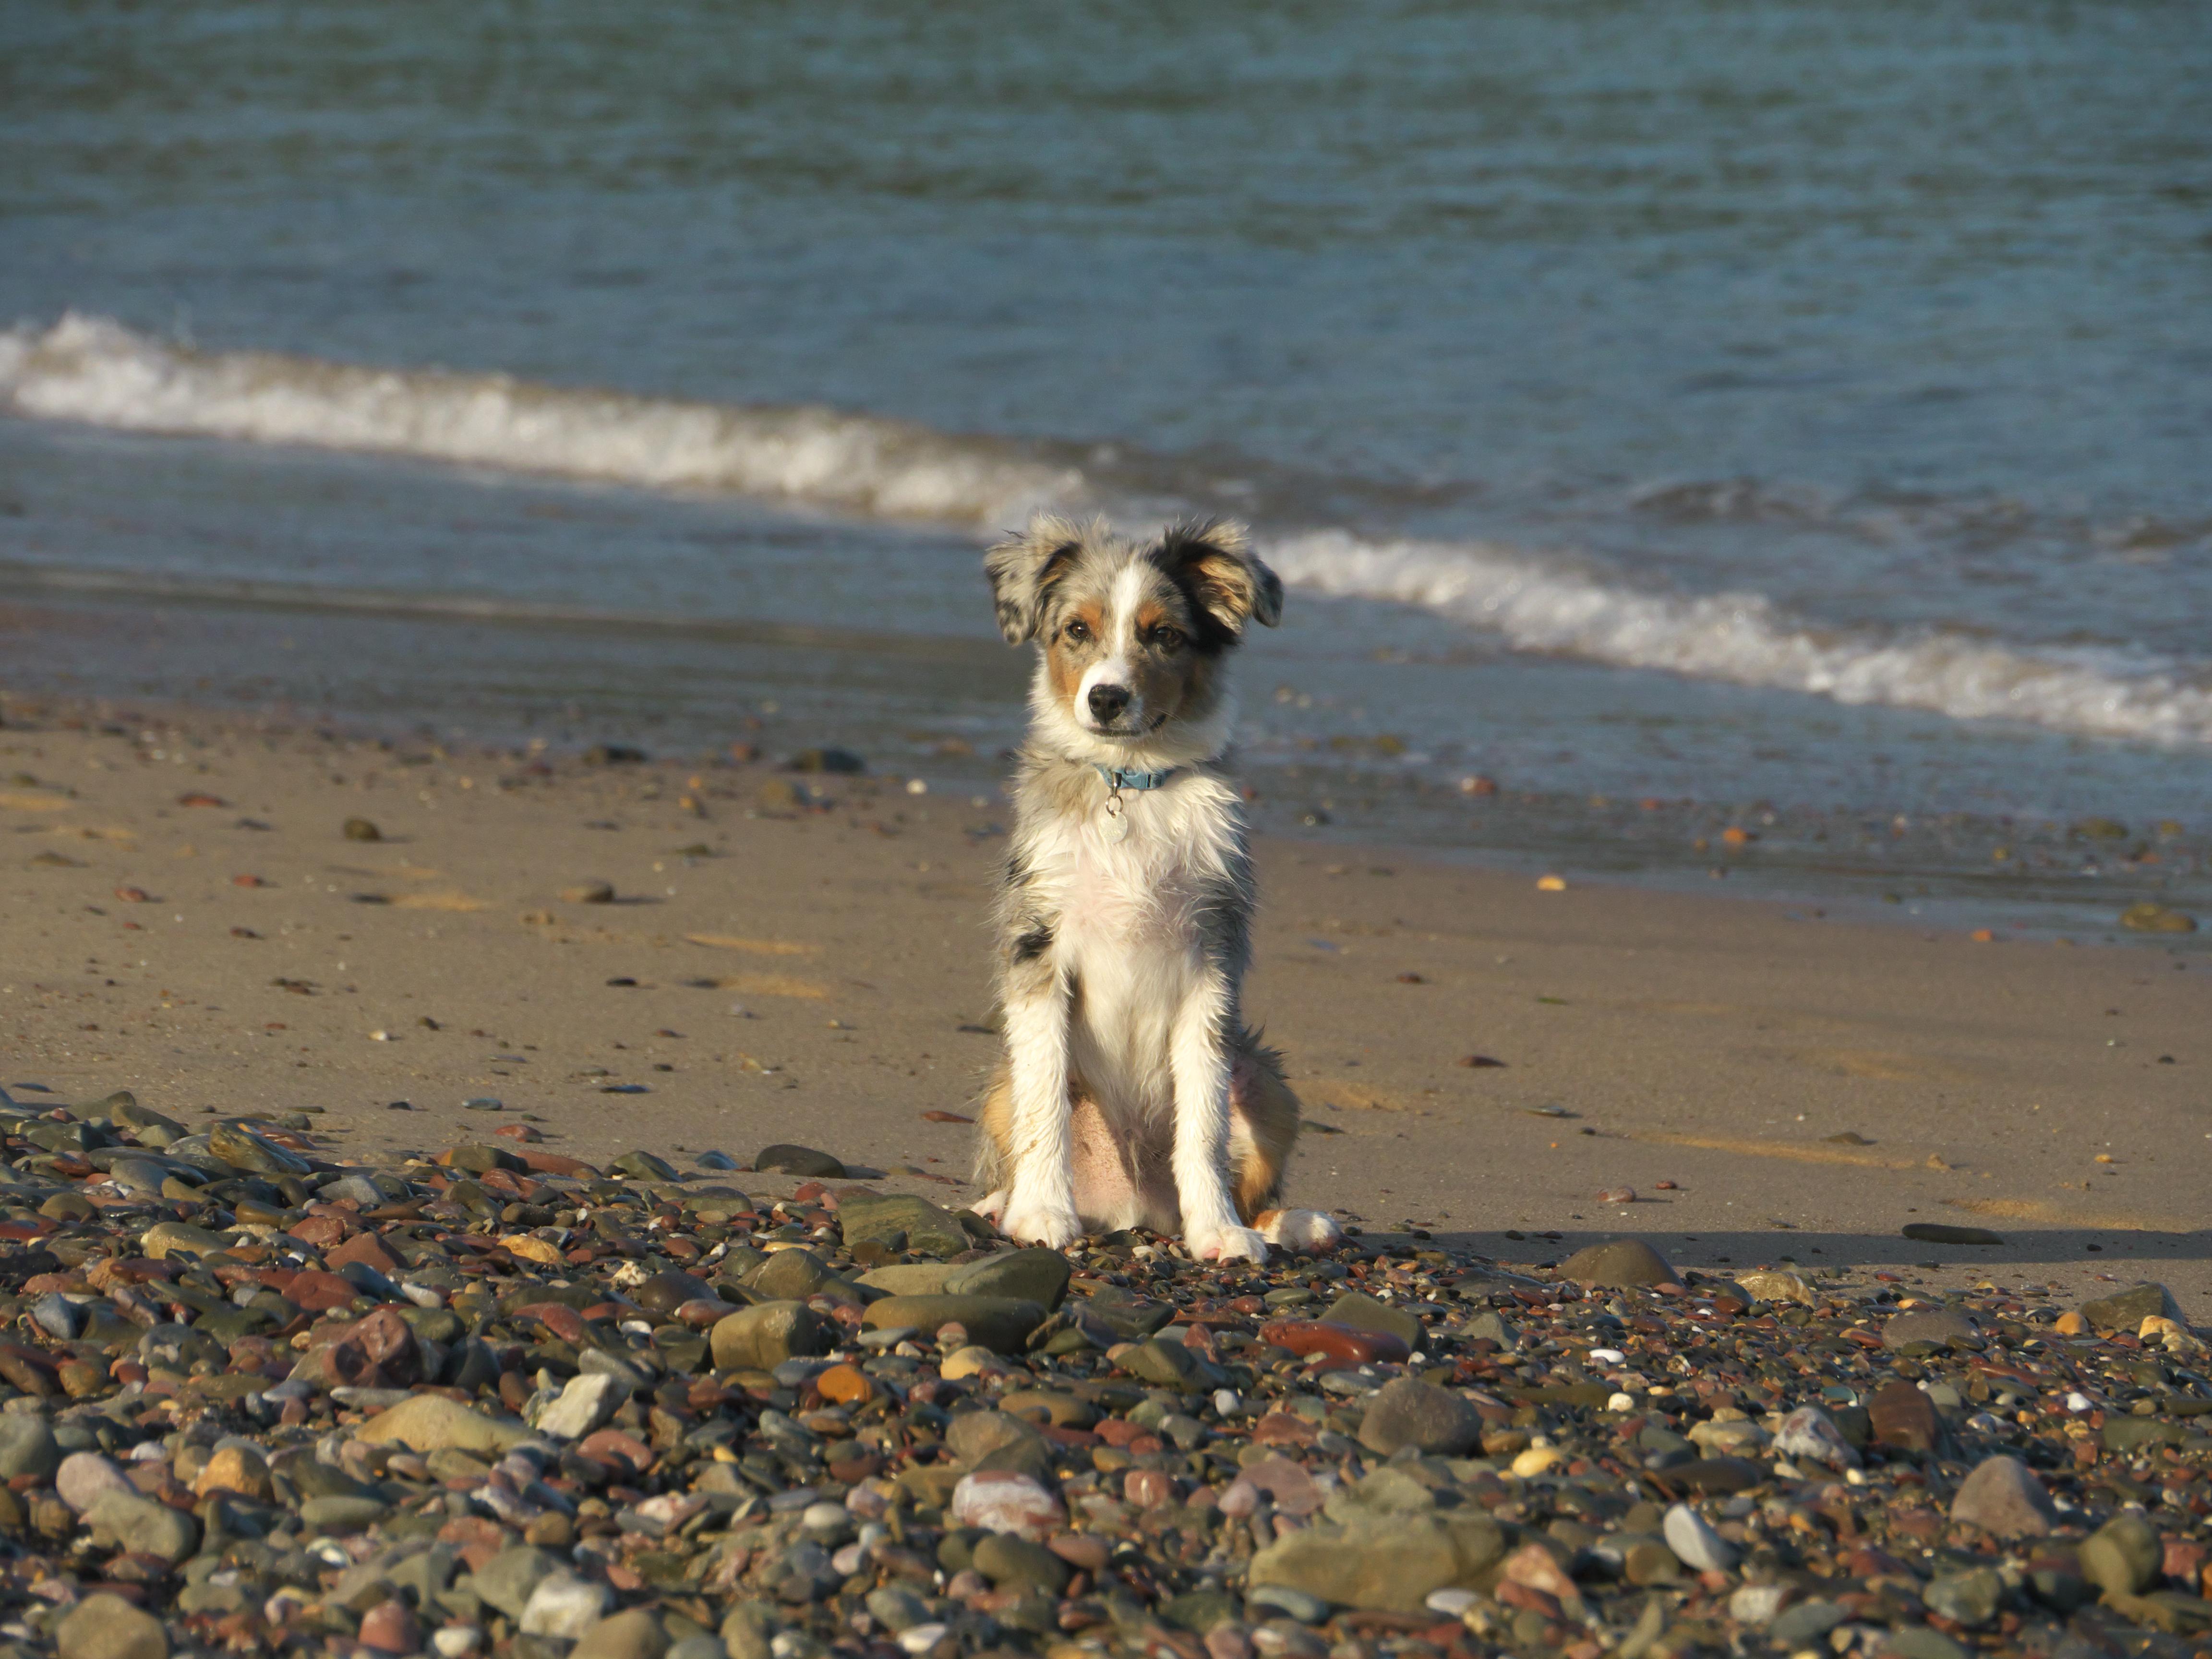 Enjoying a trip to the beach